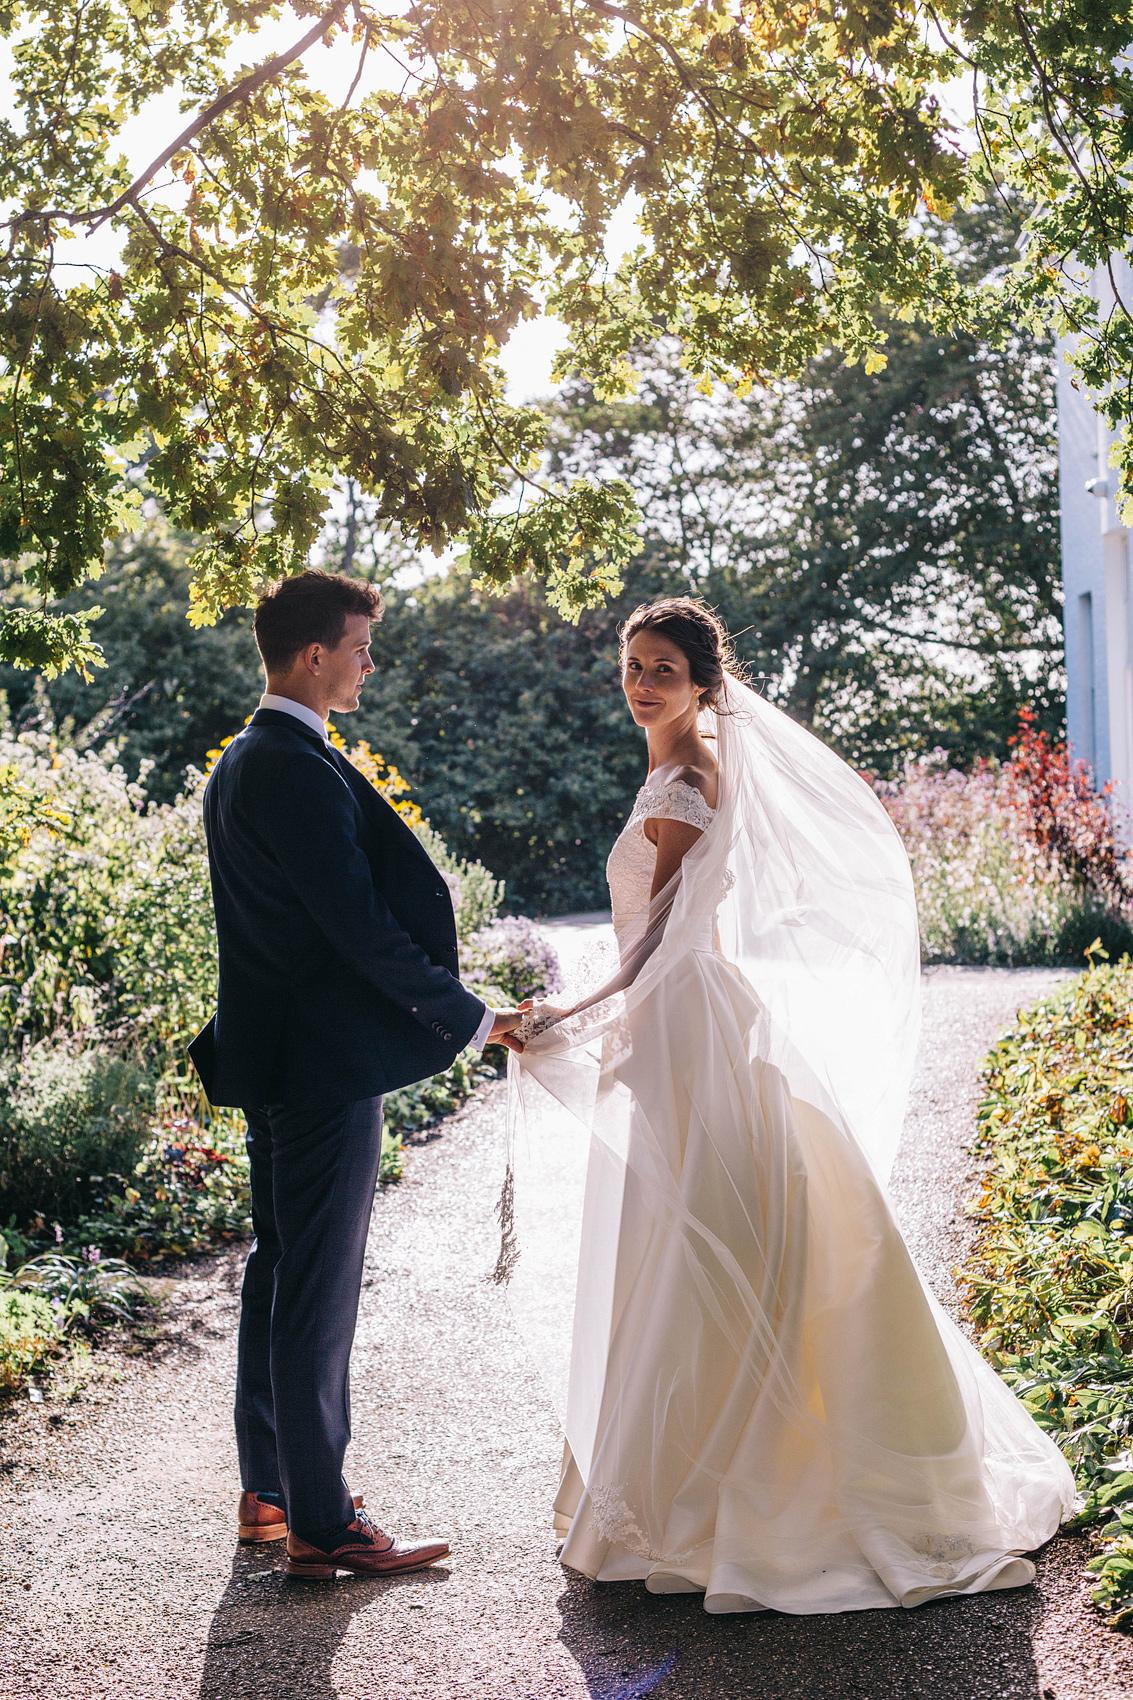 Claire_Basiuk_Richmond_Park,_London_Wedding_Photography_-12.jpg